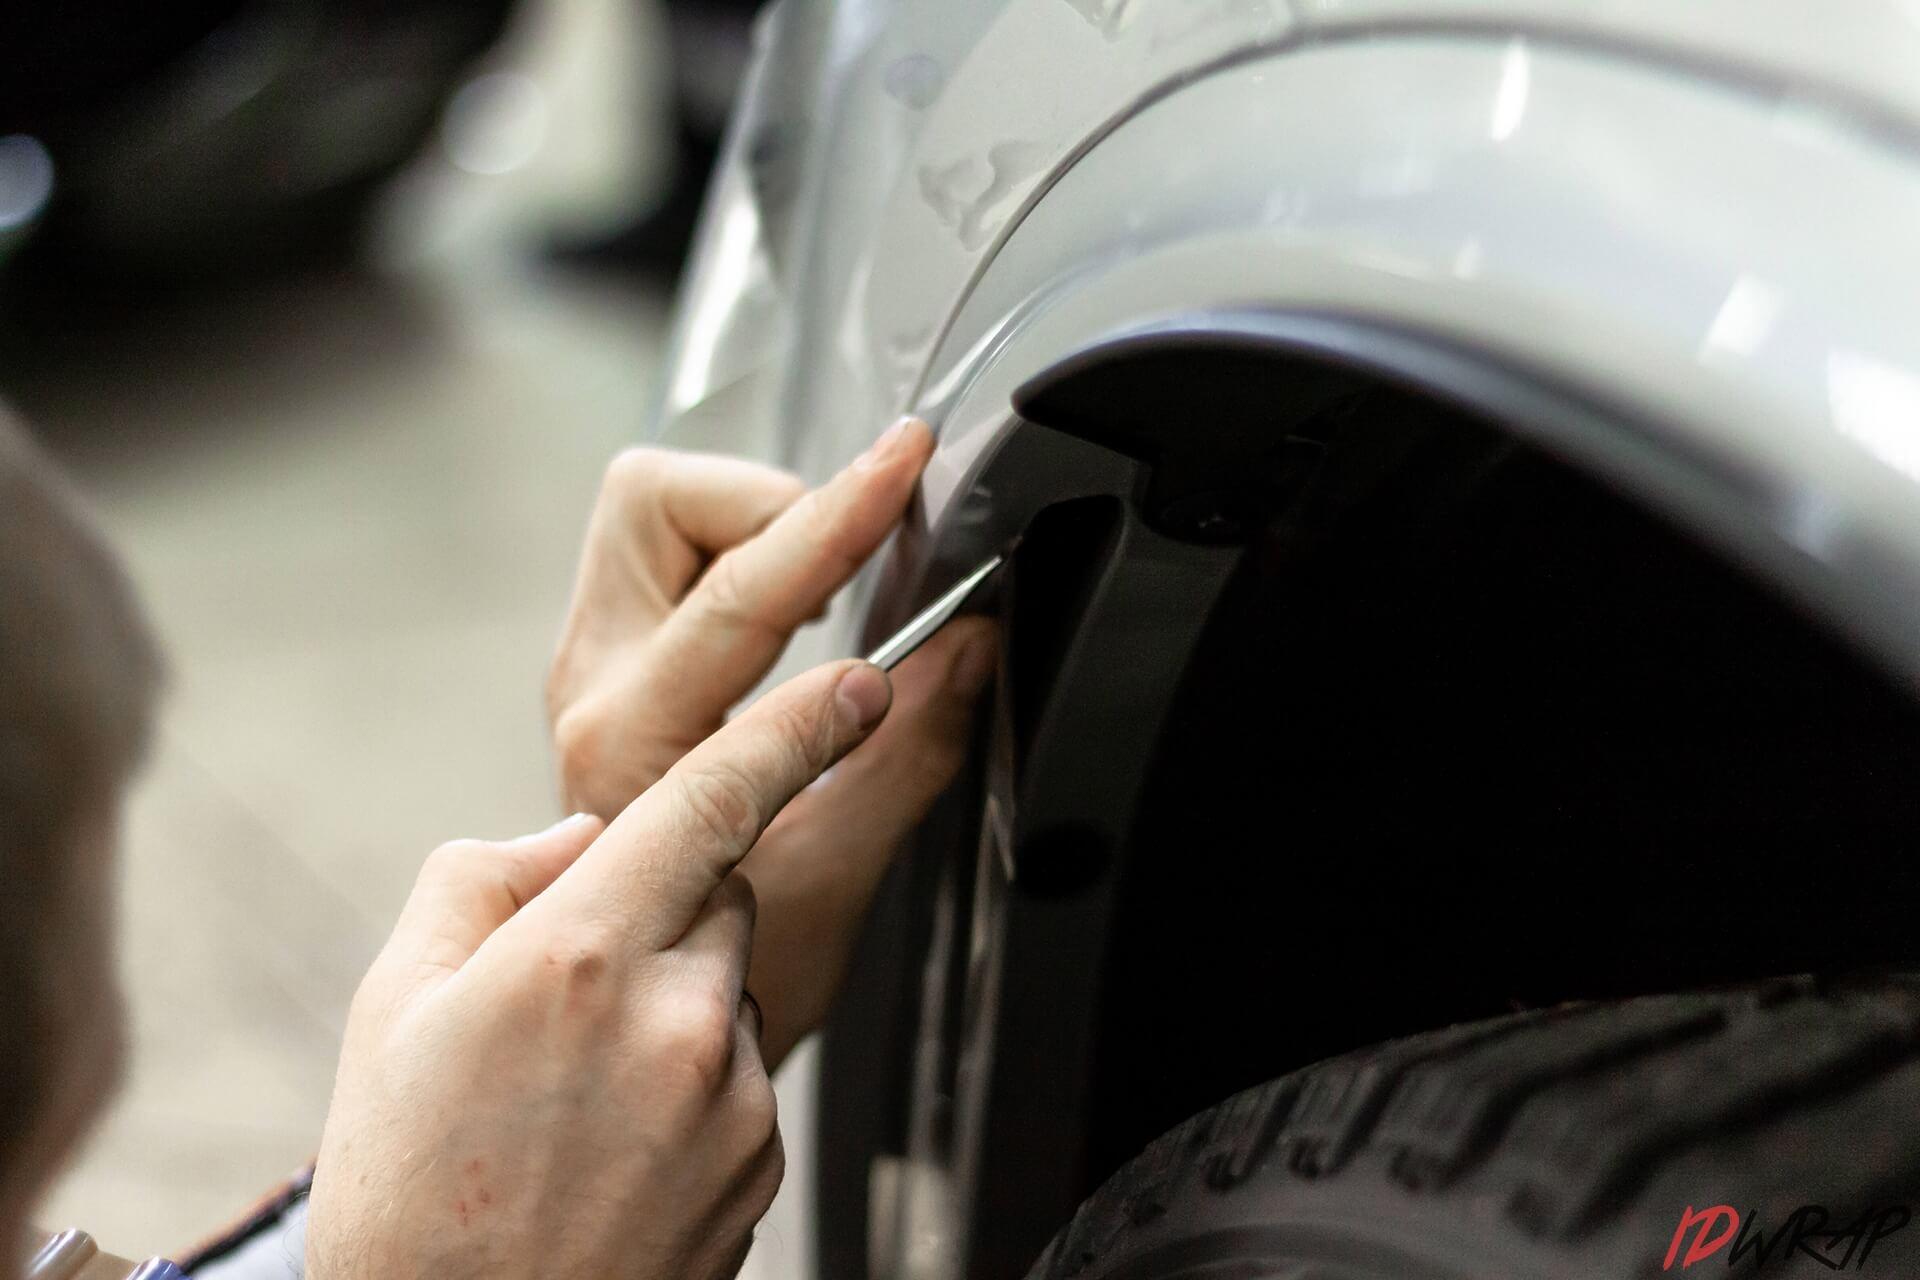 Защита зоны риска BMW X5 пленкой Spectroll